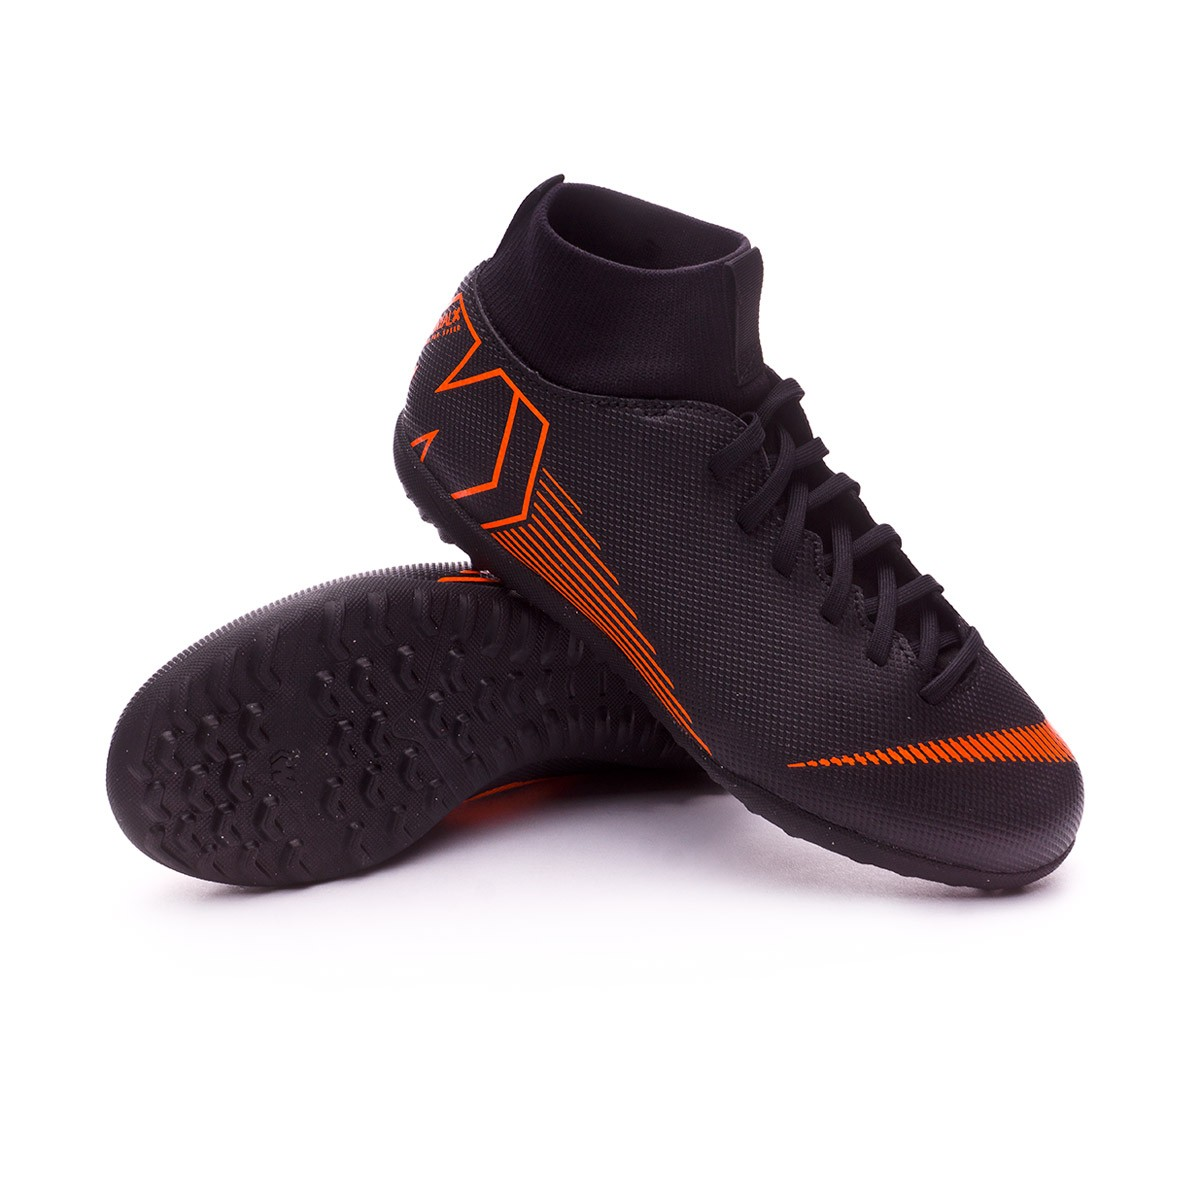 separation shoes 4e5dd ed6e4 Zapatilla Mercurial SuperflyX VI Club Turf Niño Black-Total orange-White